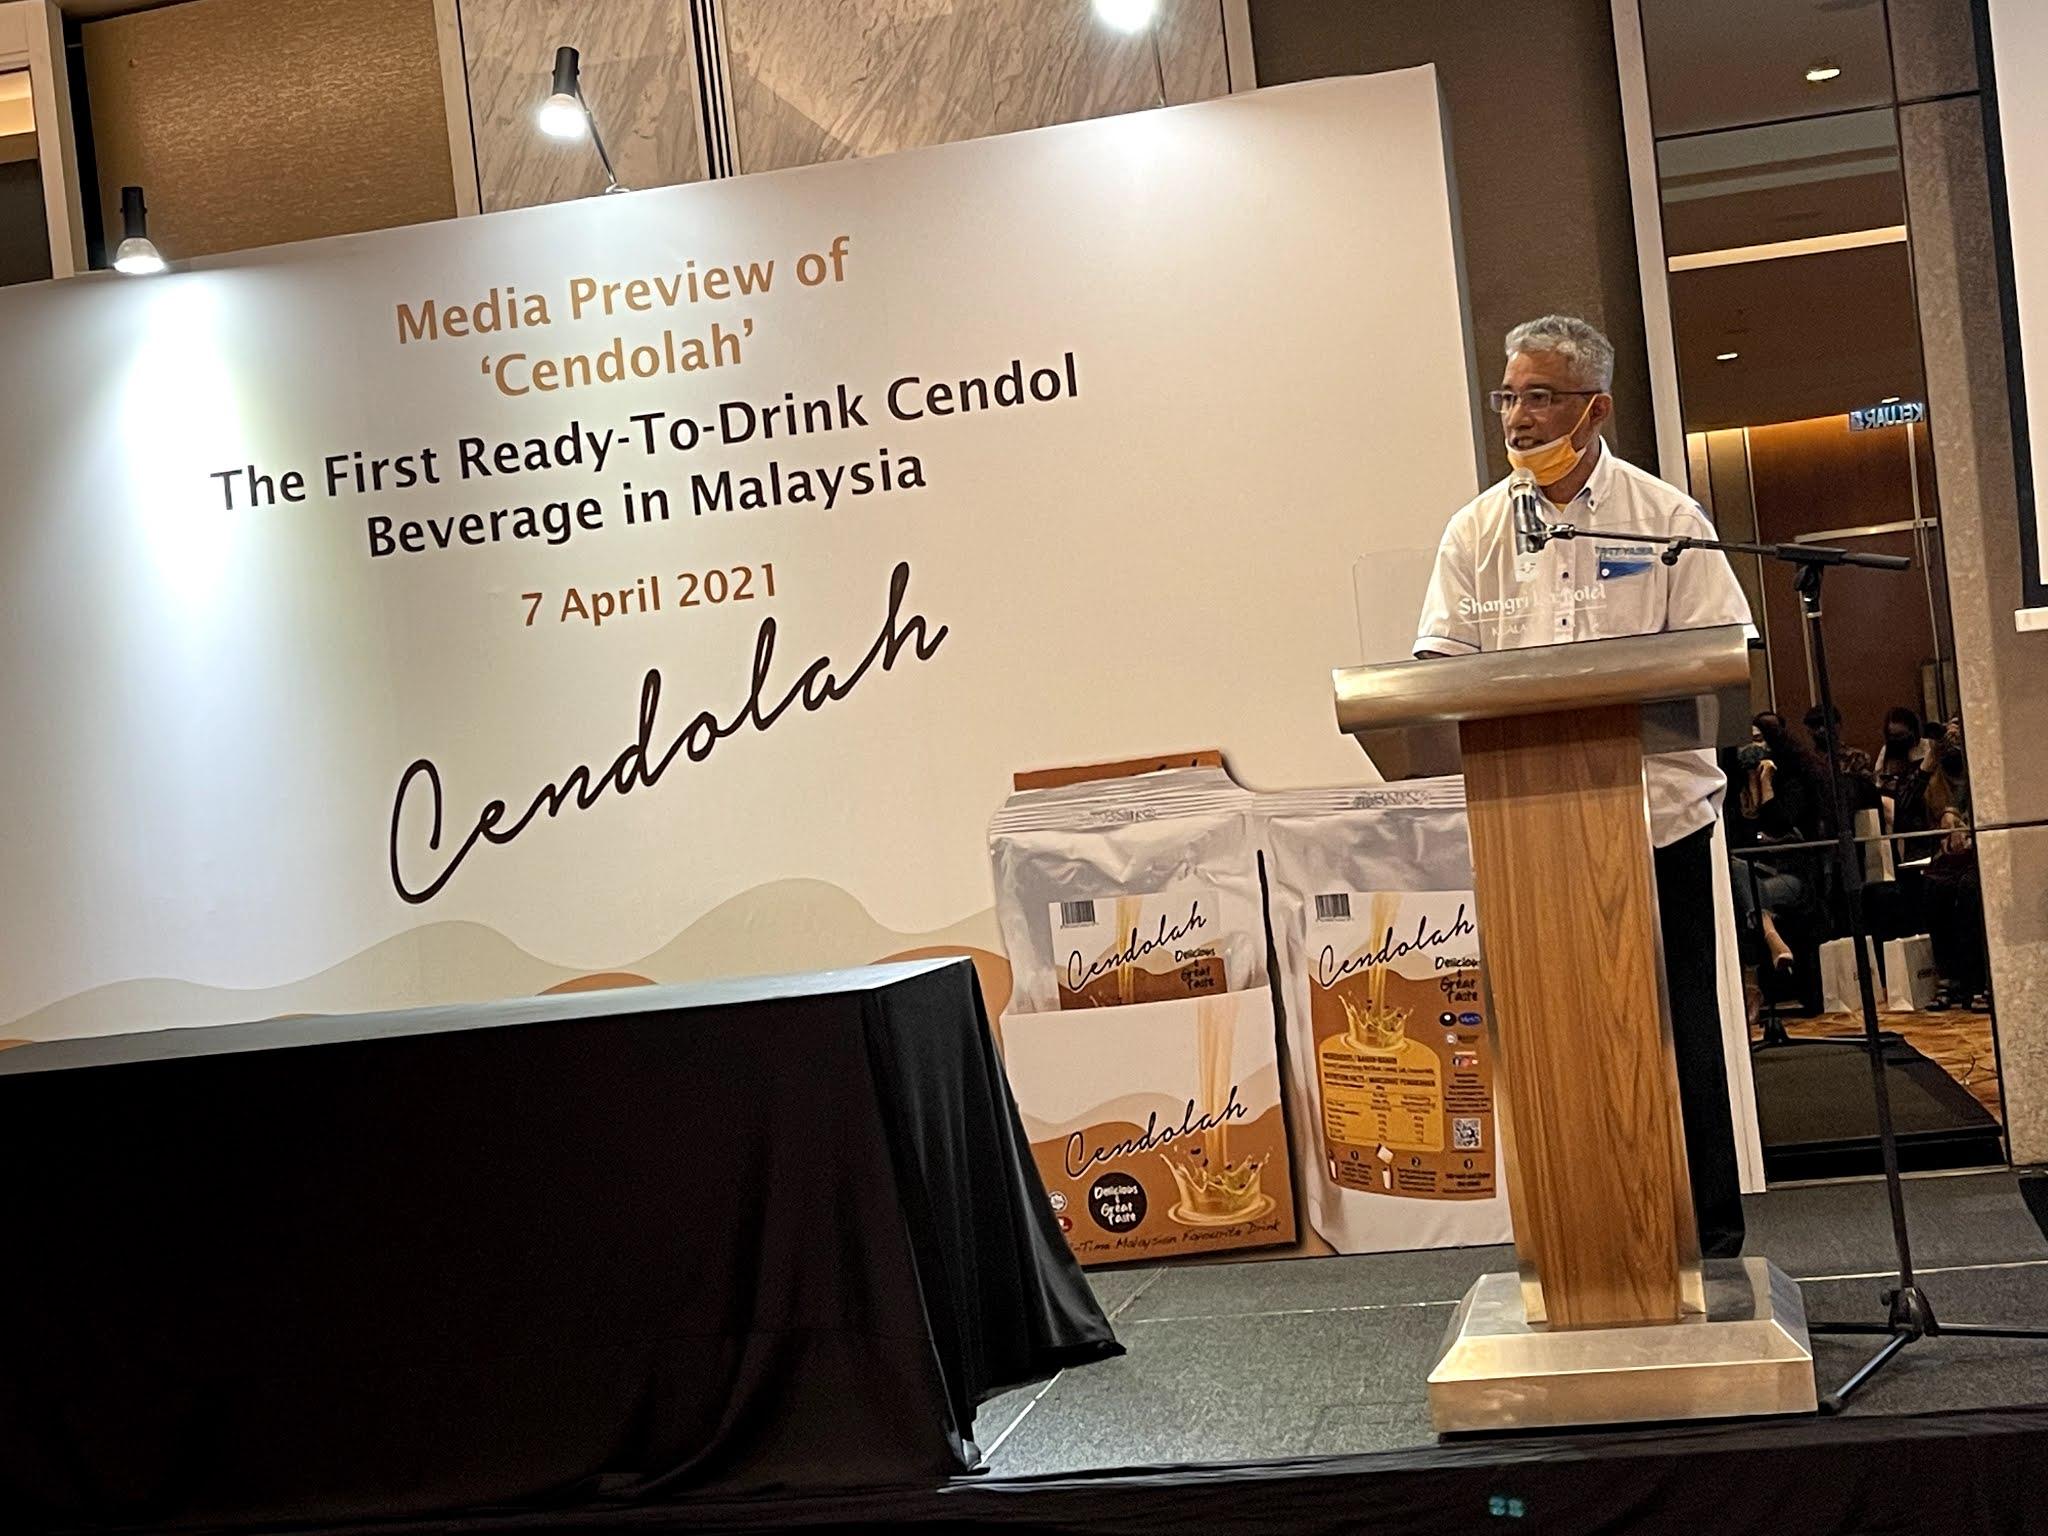 CENDOLAH MINUMAN CENDOL READY-TO-DRINK PERTAMA DI MALAYSIA!